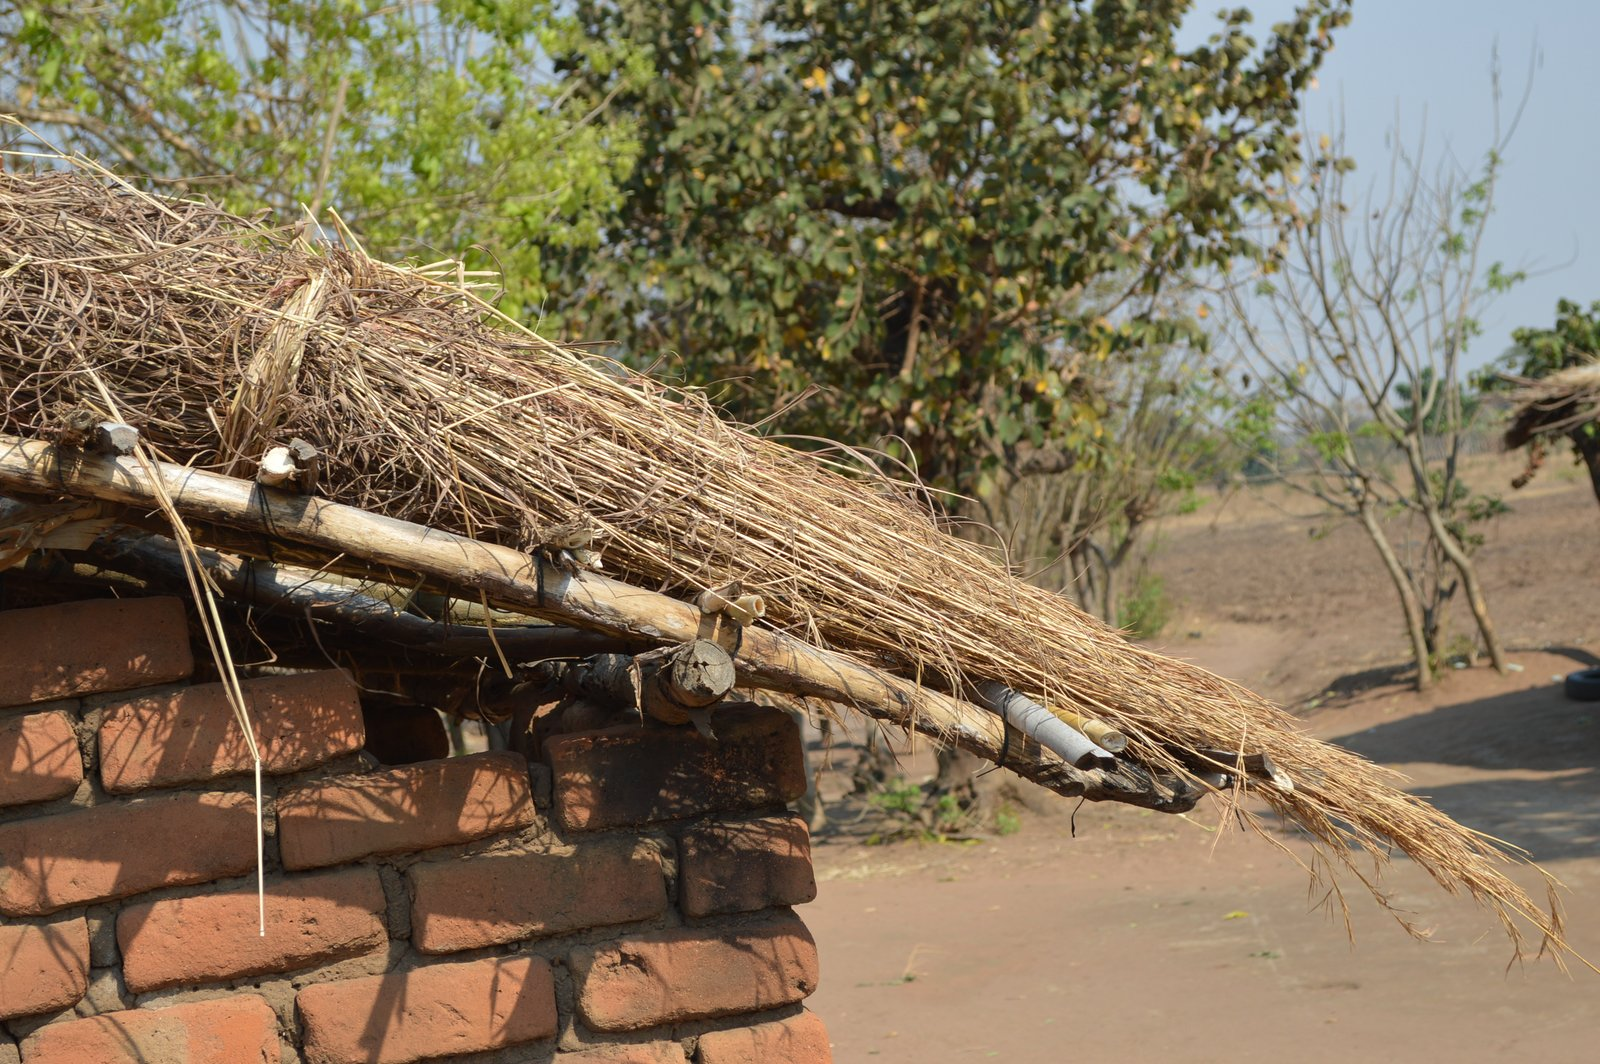 Malawi Vernacular Architecture (13)